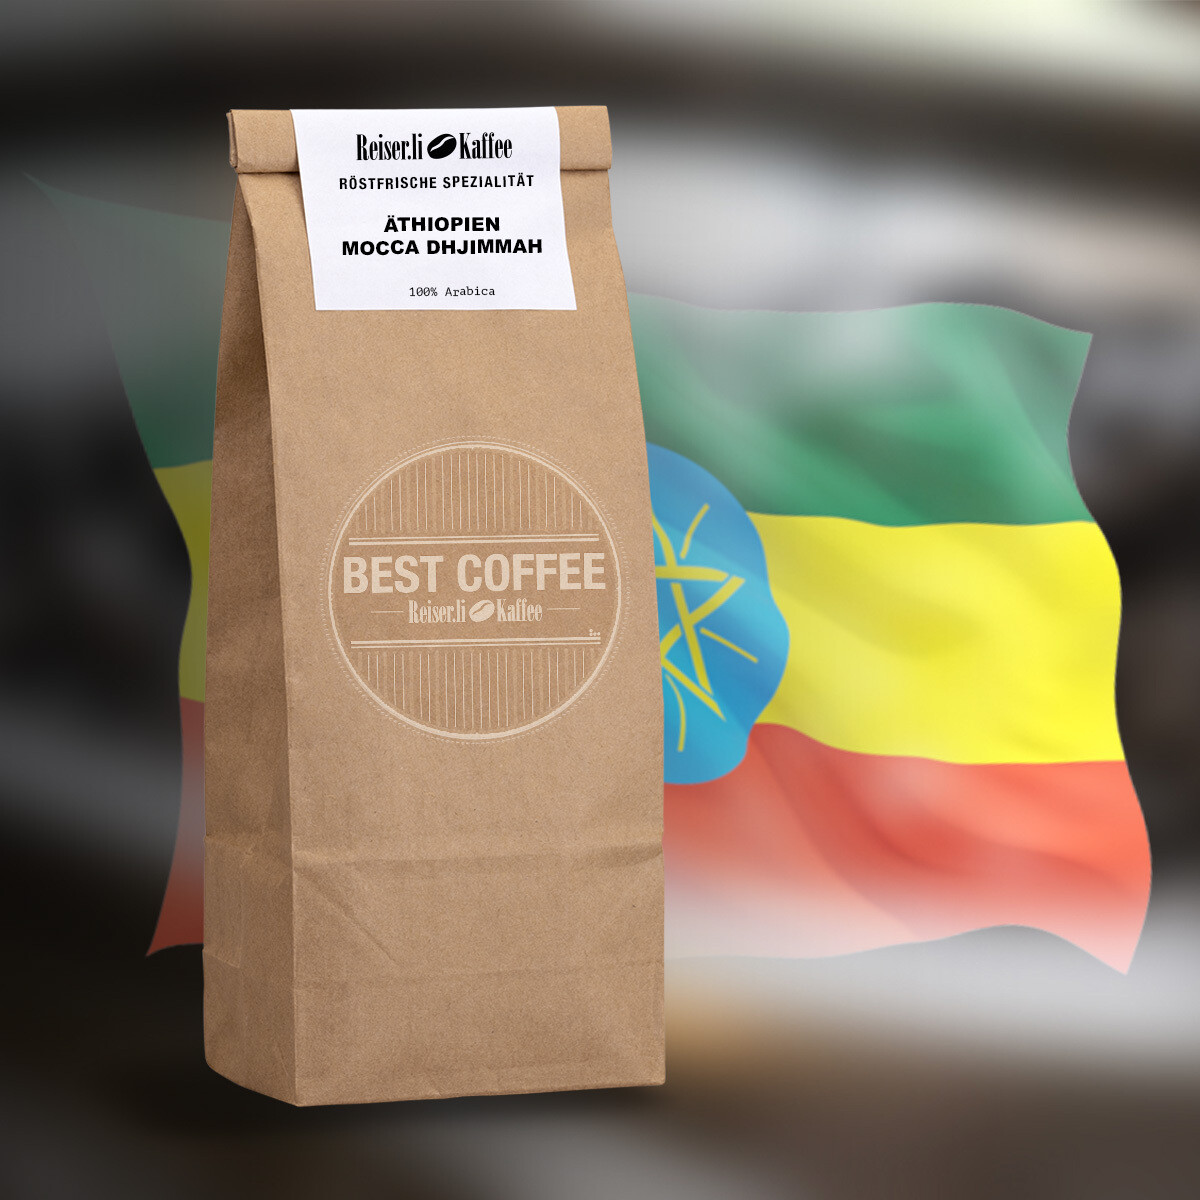 Äthiopien MOCCA DJIMMAH (200gr)